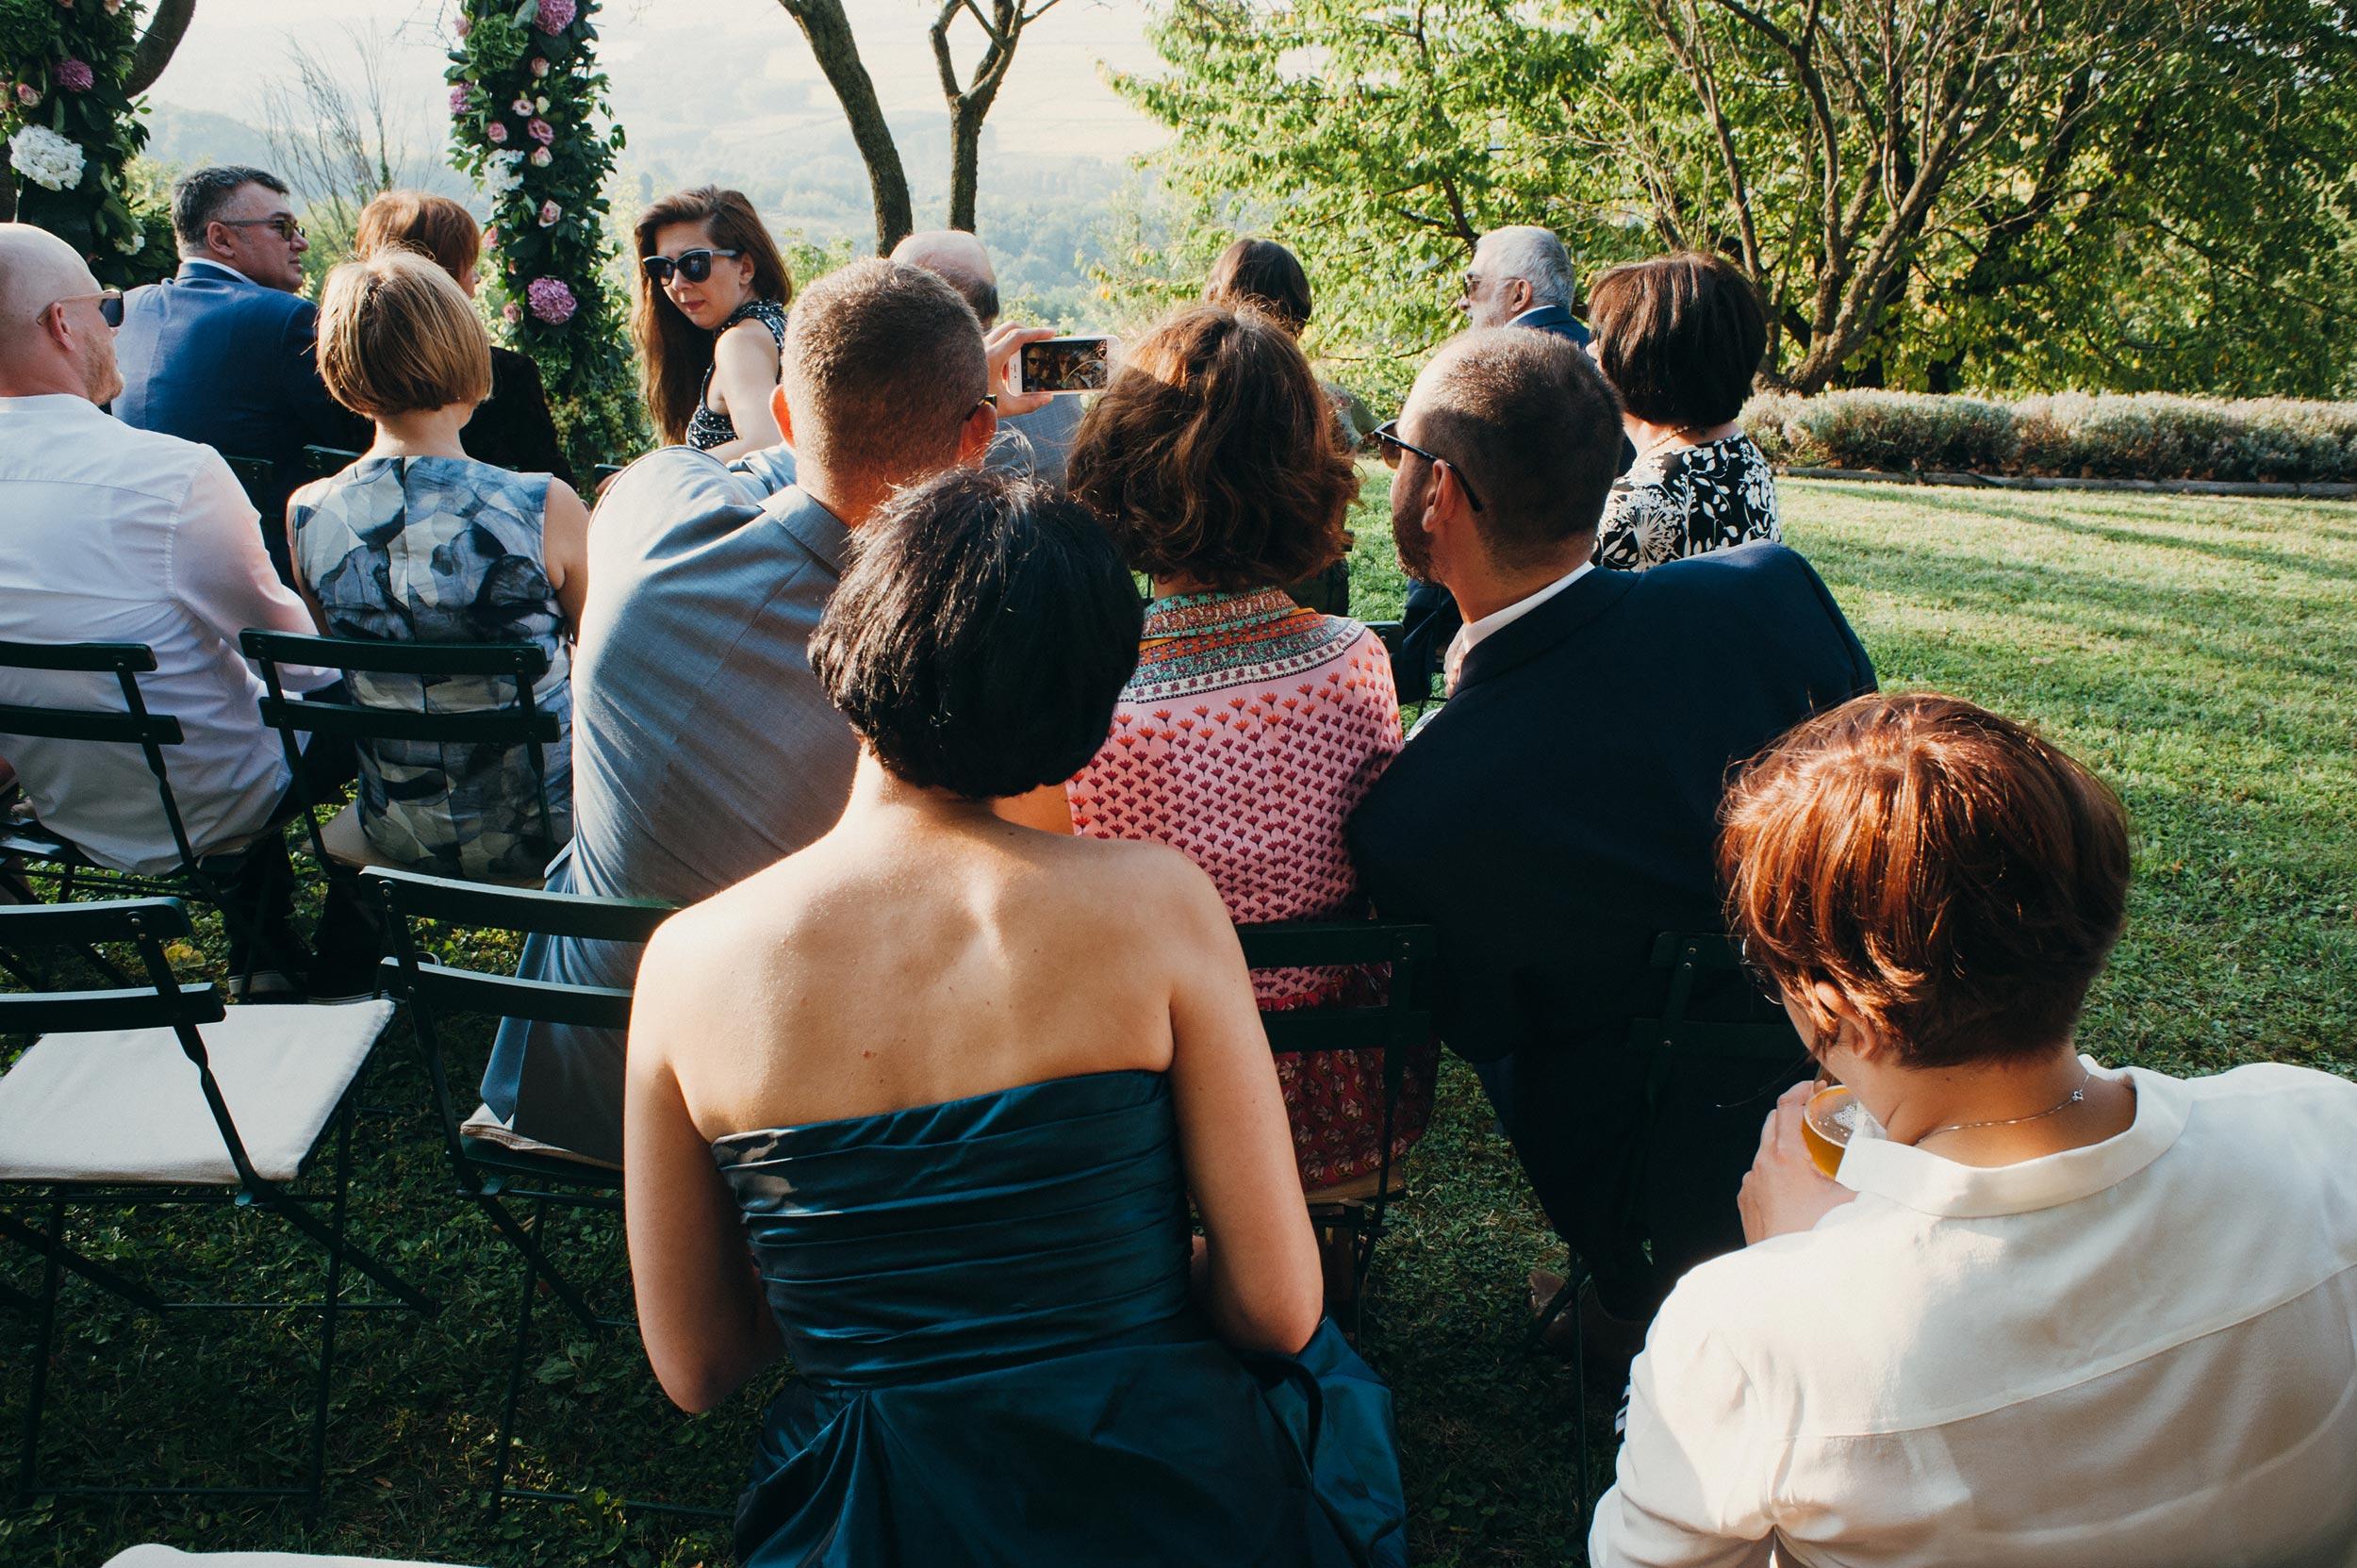 2016-Davor-Chiara-Monferrato-Asti-Vercelli-Wedding-Photographer-Italy-Alessandro-Avenali-22.jpg